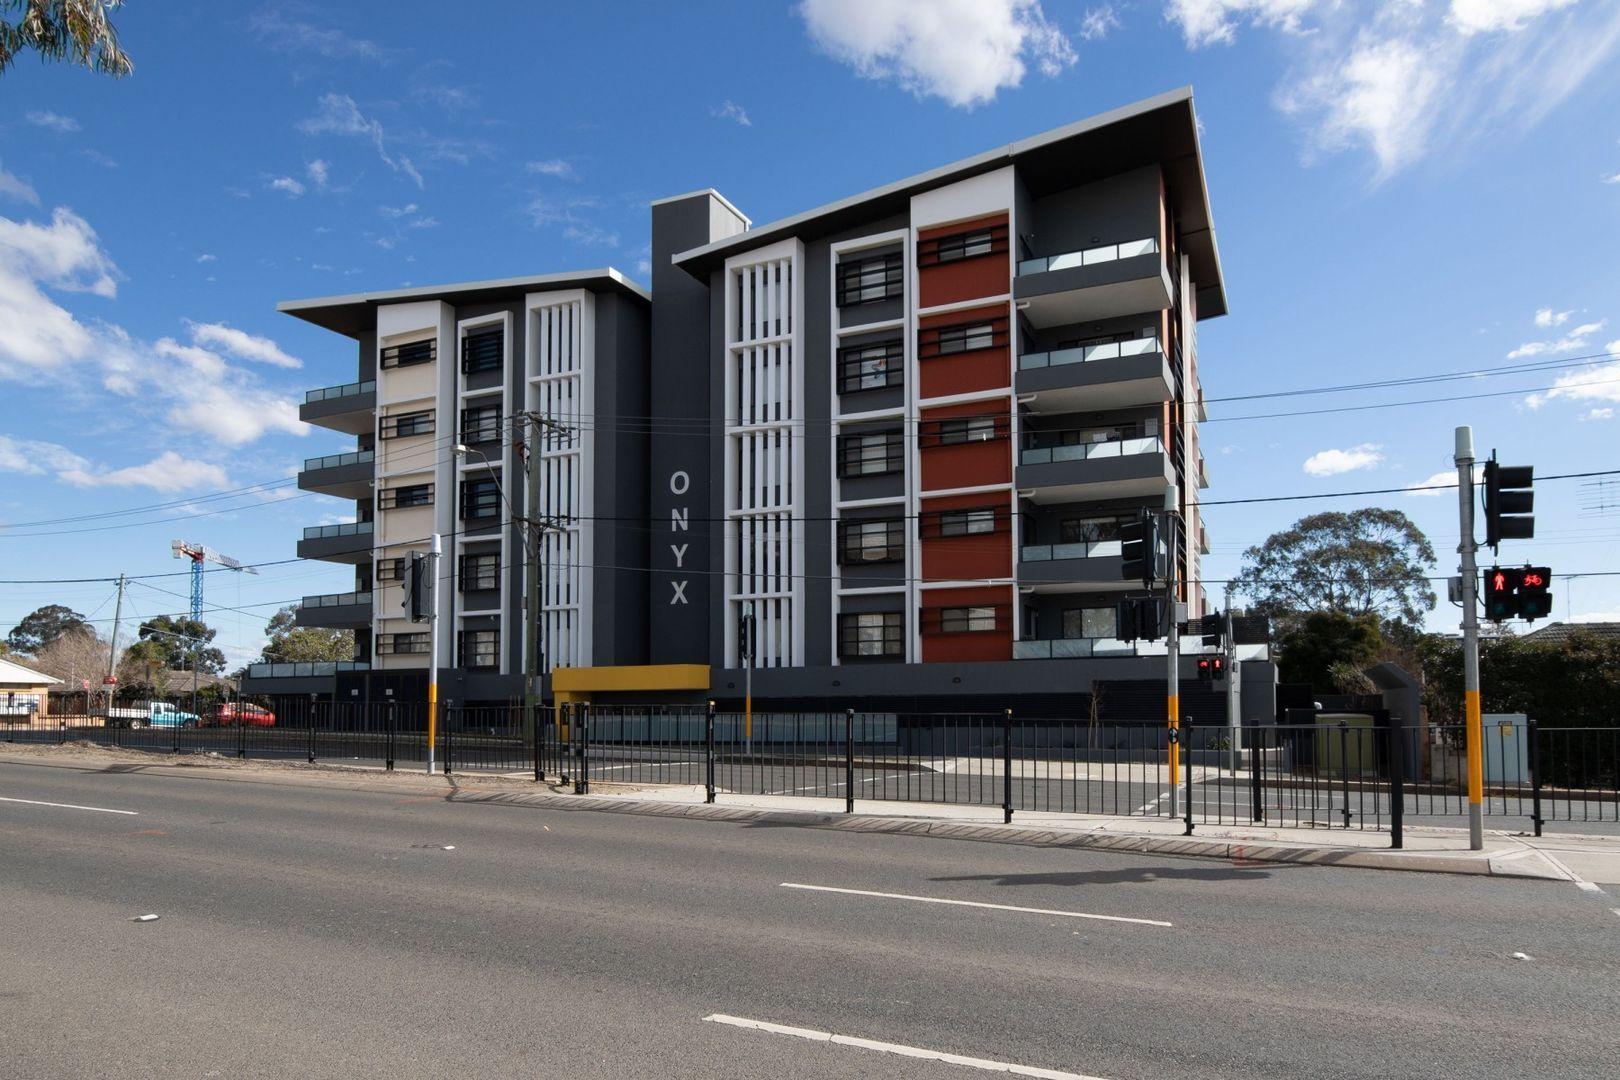 5/5 Lethbridge St, Penrith NSW 2750, Image 0